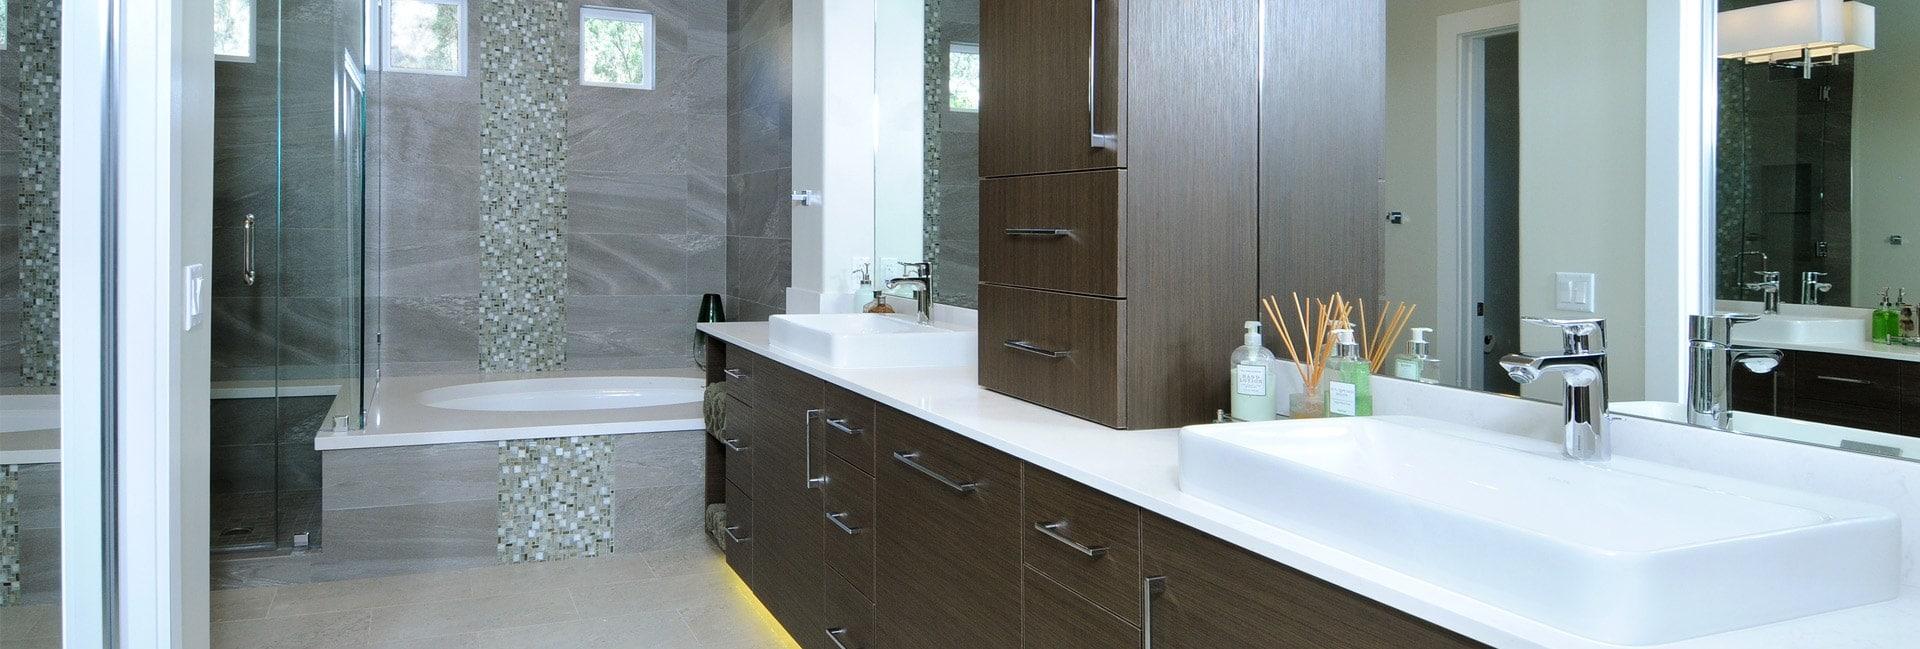 Bathroom interior design of a house in Glendale, CA